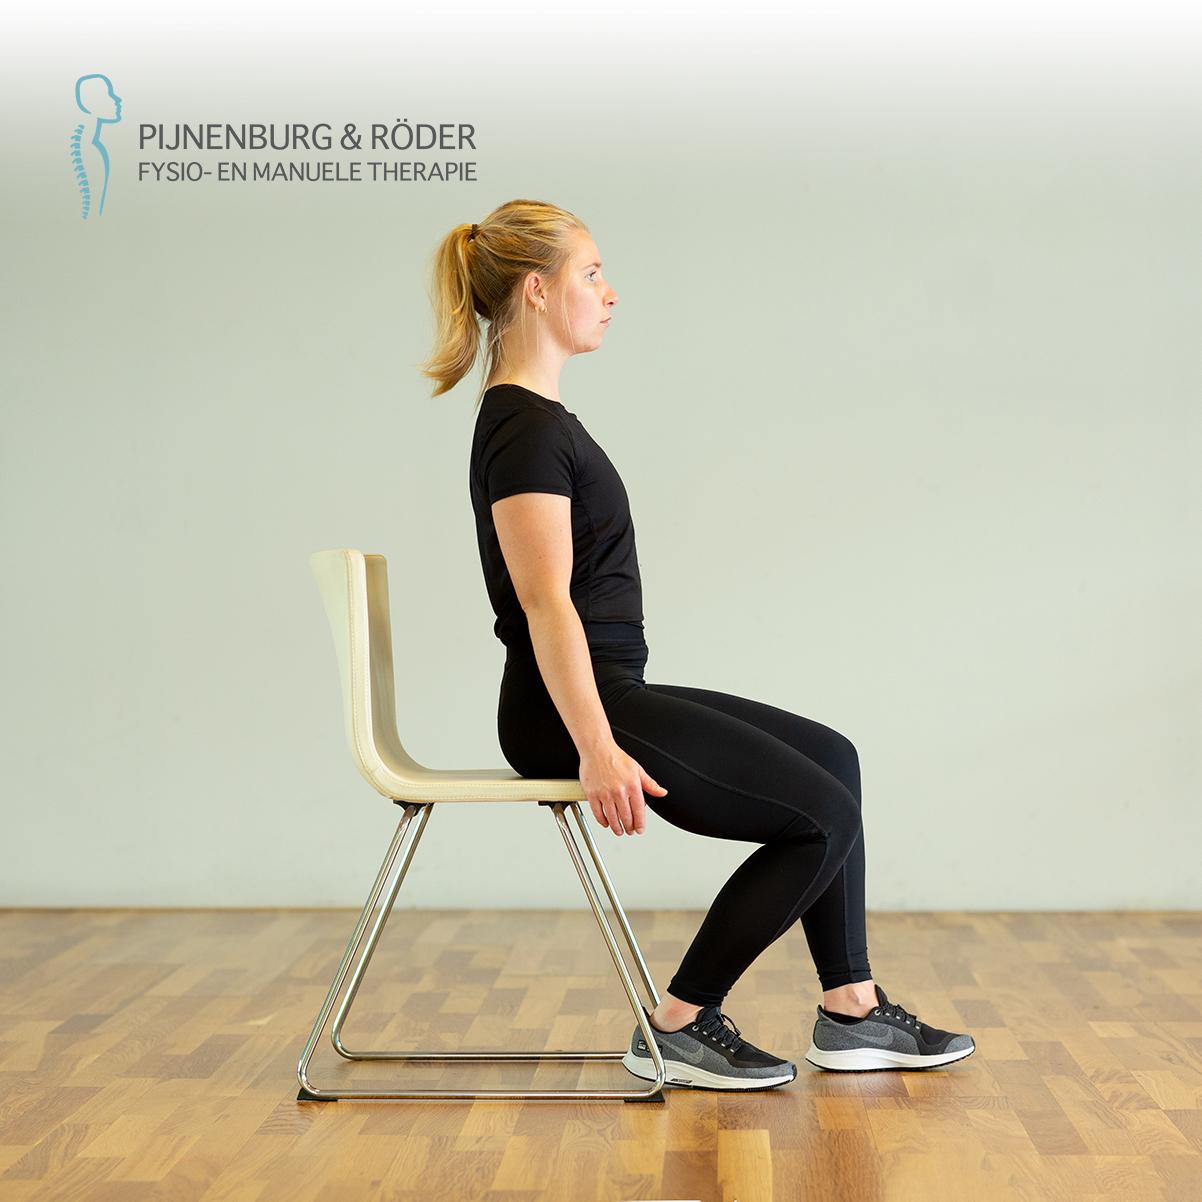 enkel mobiliteit dorsaal flexie